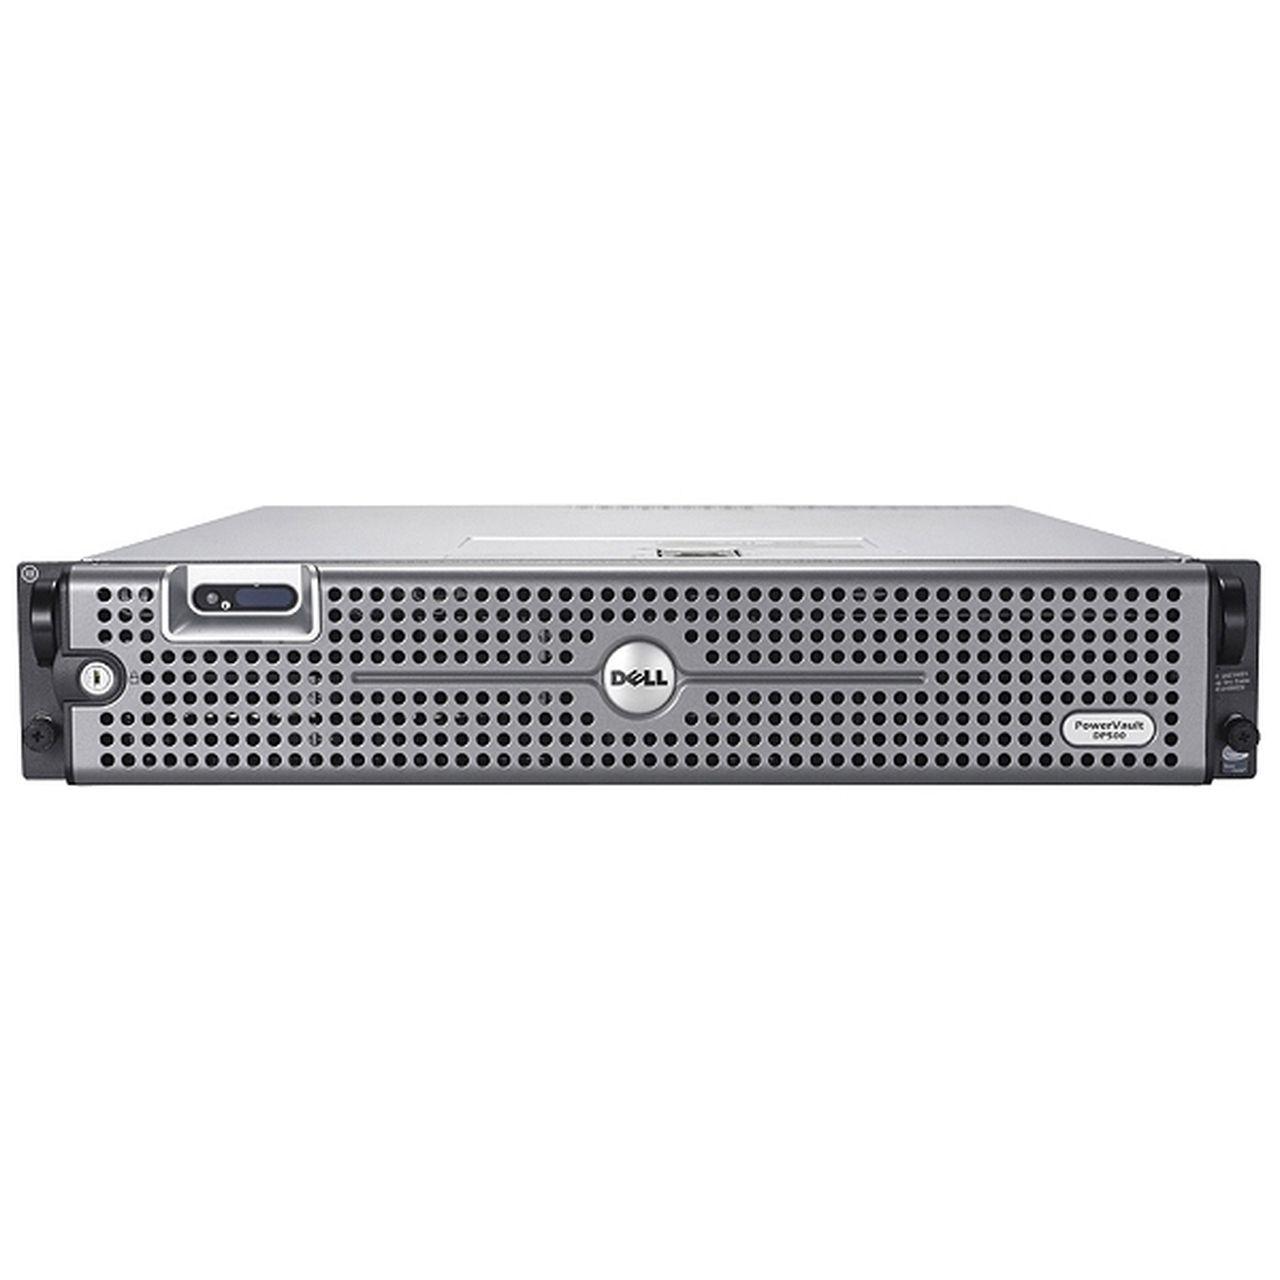 DELL Poweredge 2850 XEON 3.20 GHZ